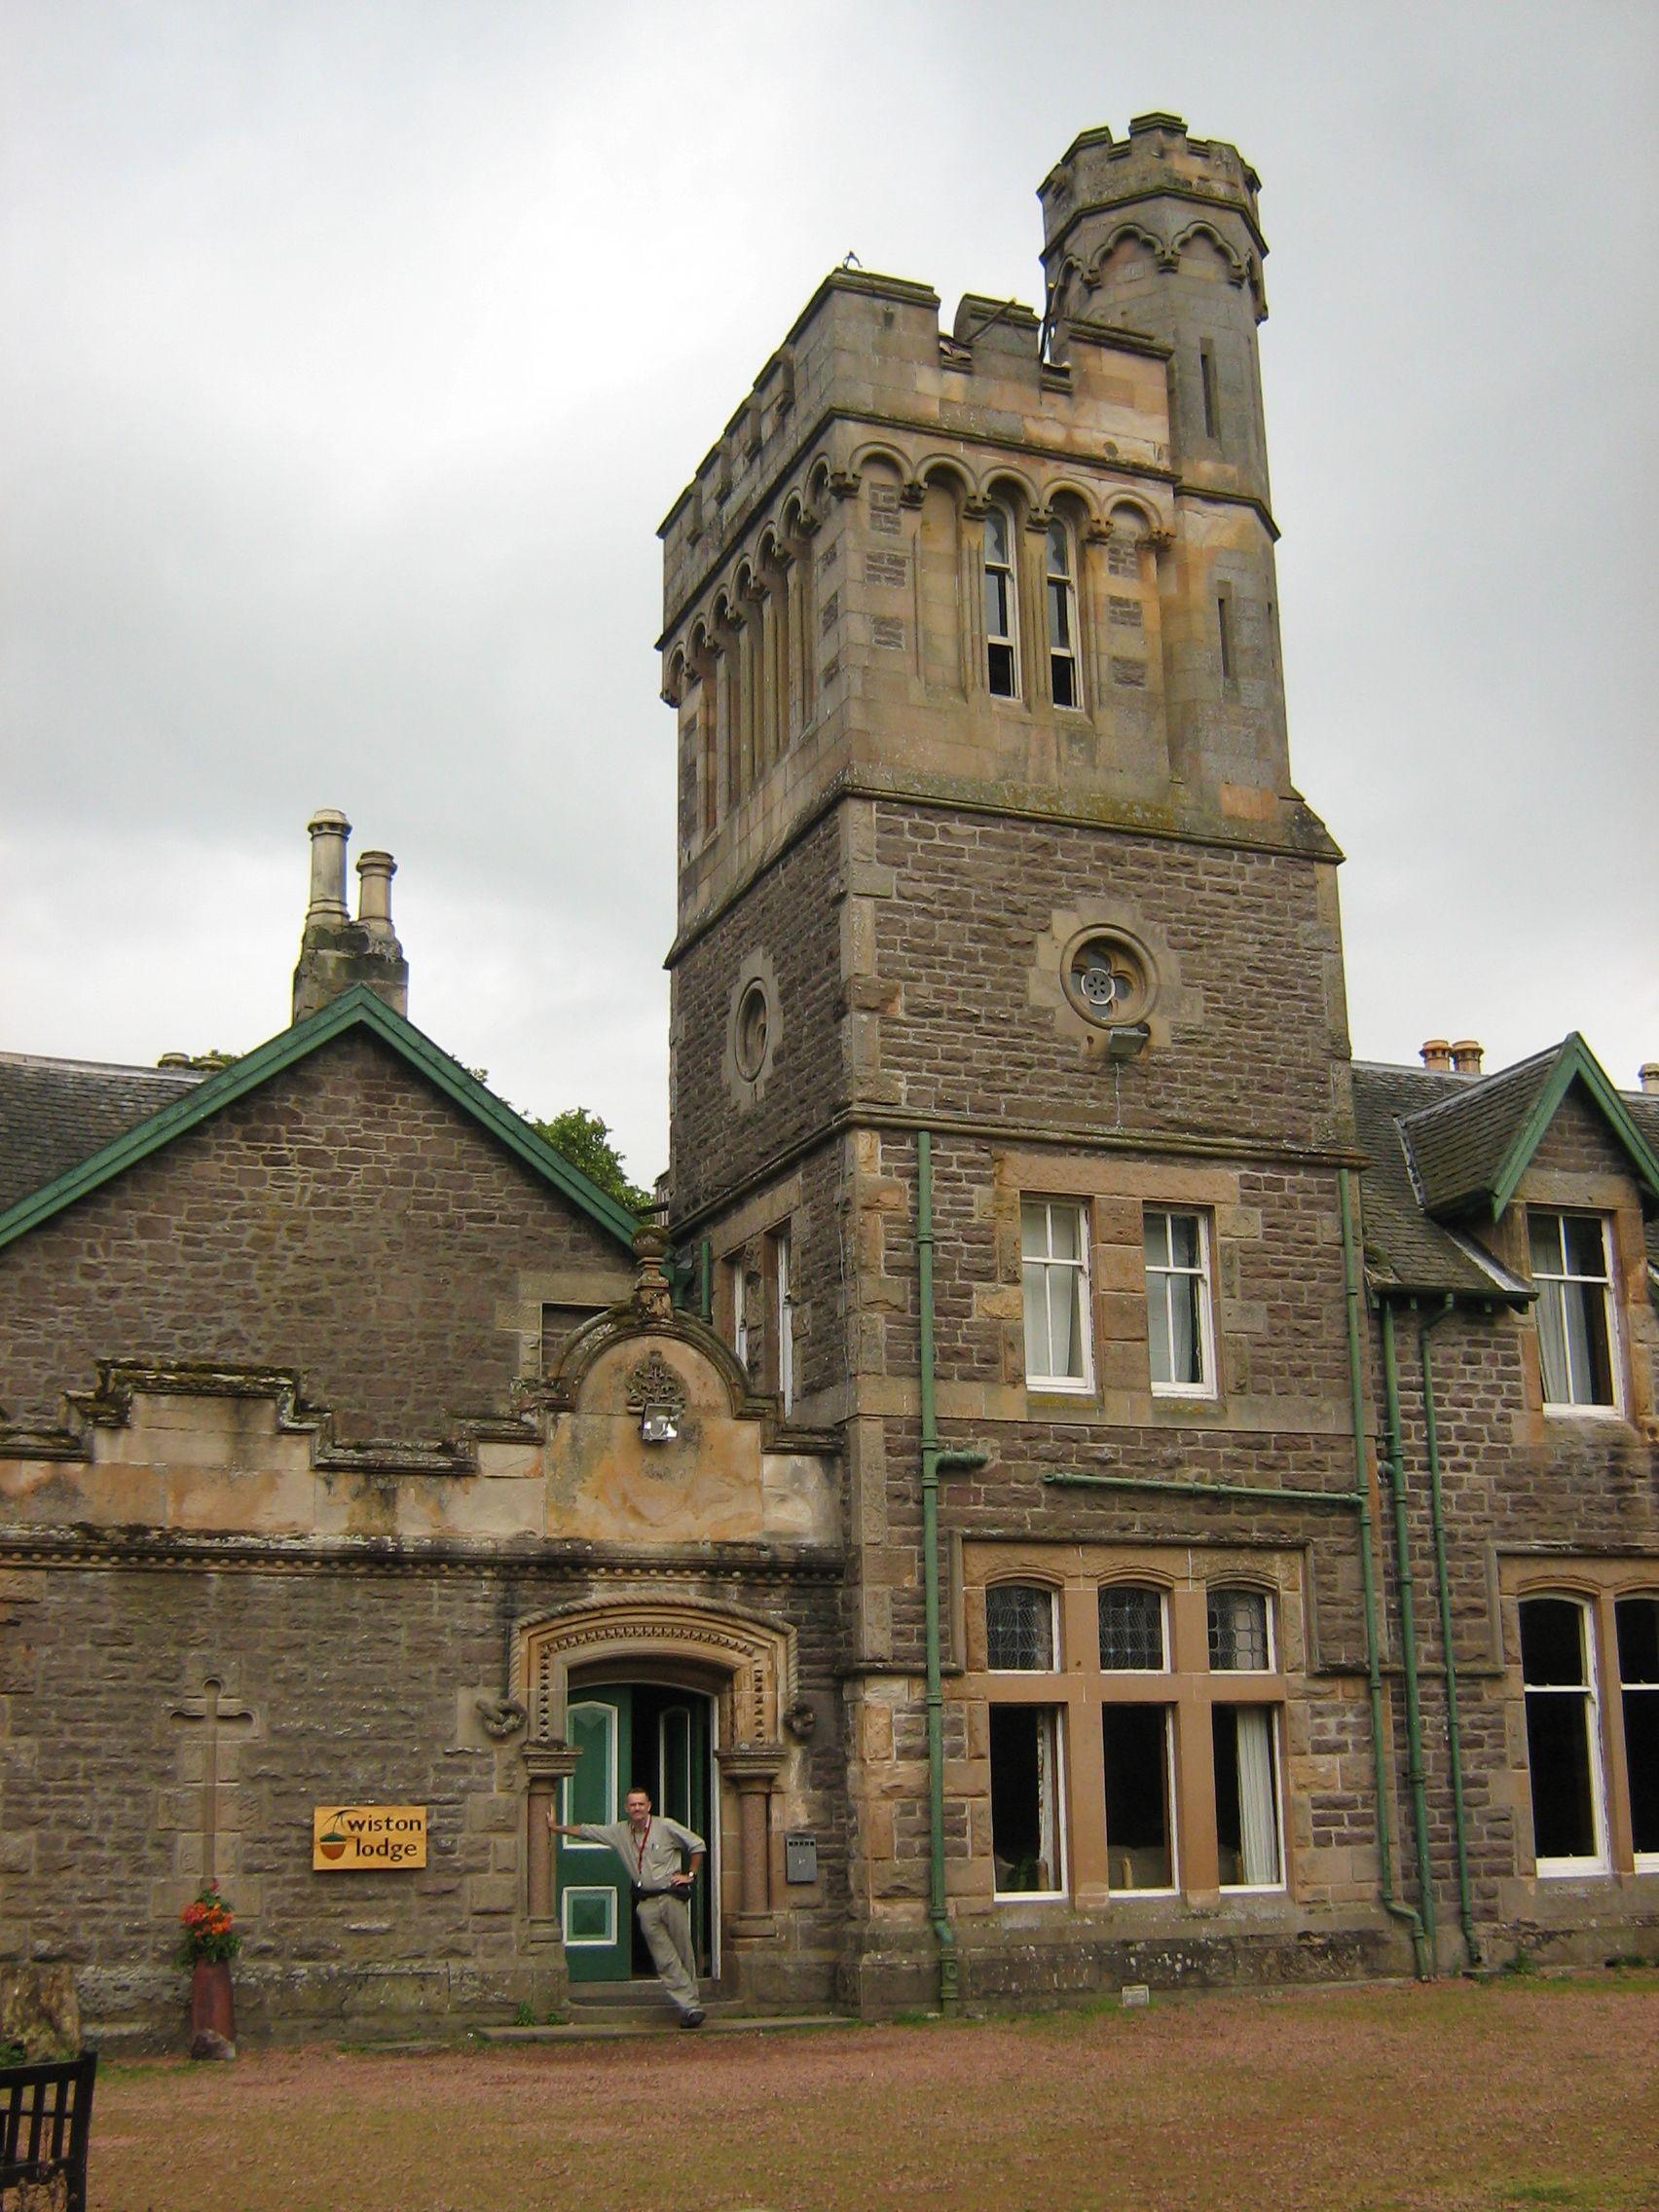 Wiston Lodge